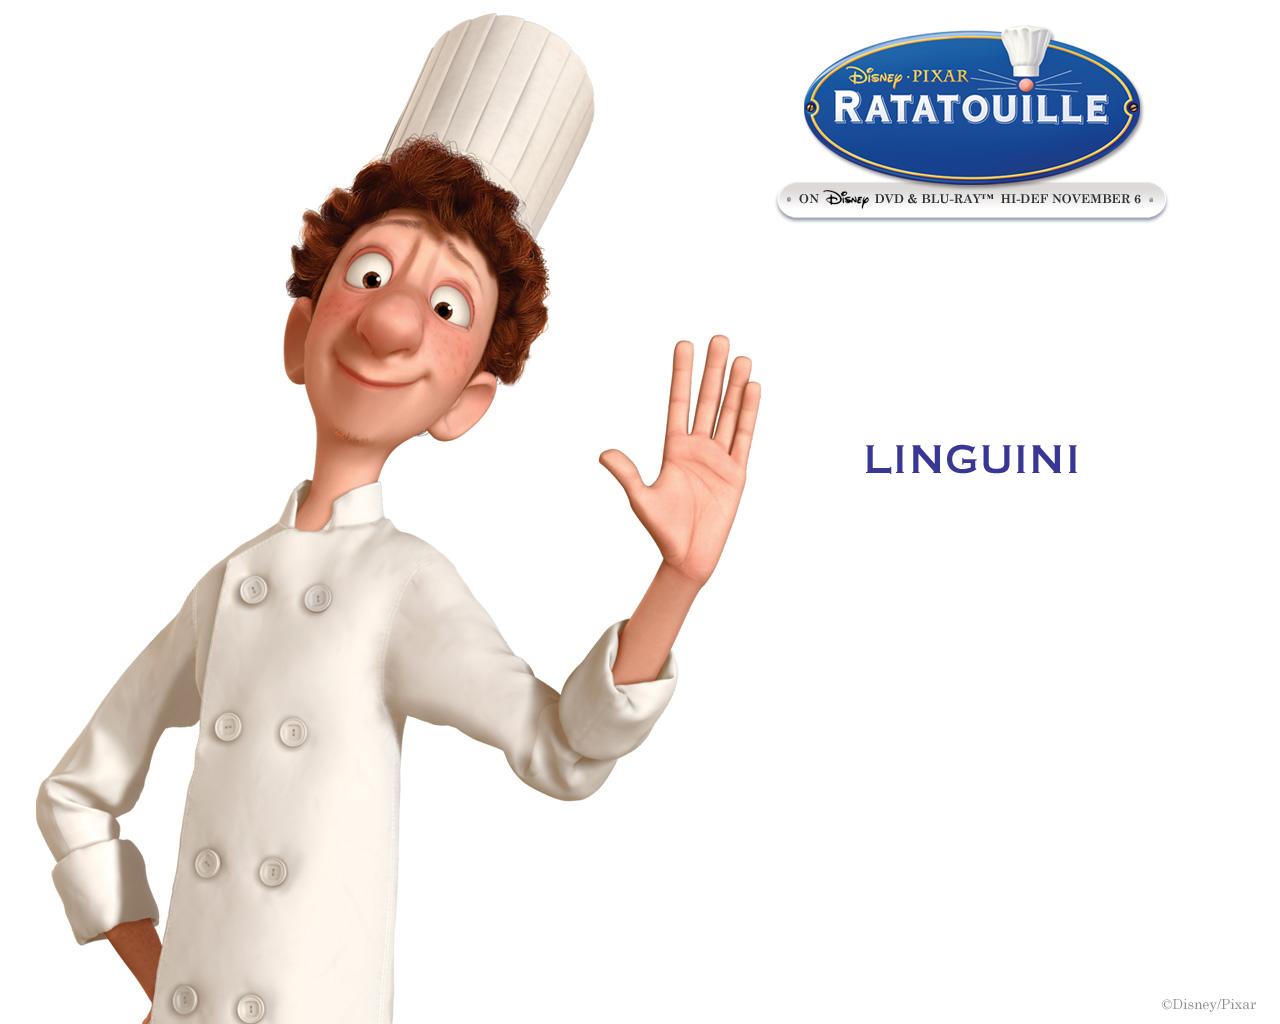 Linguini ratatouille